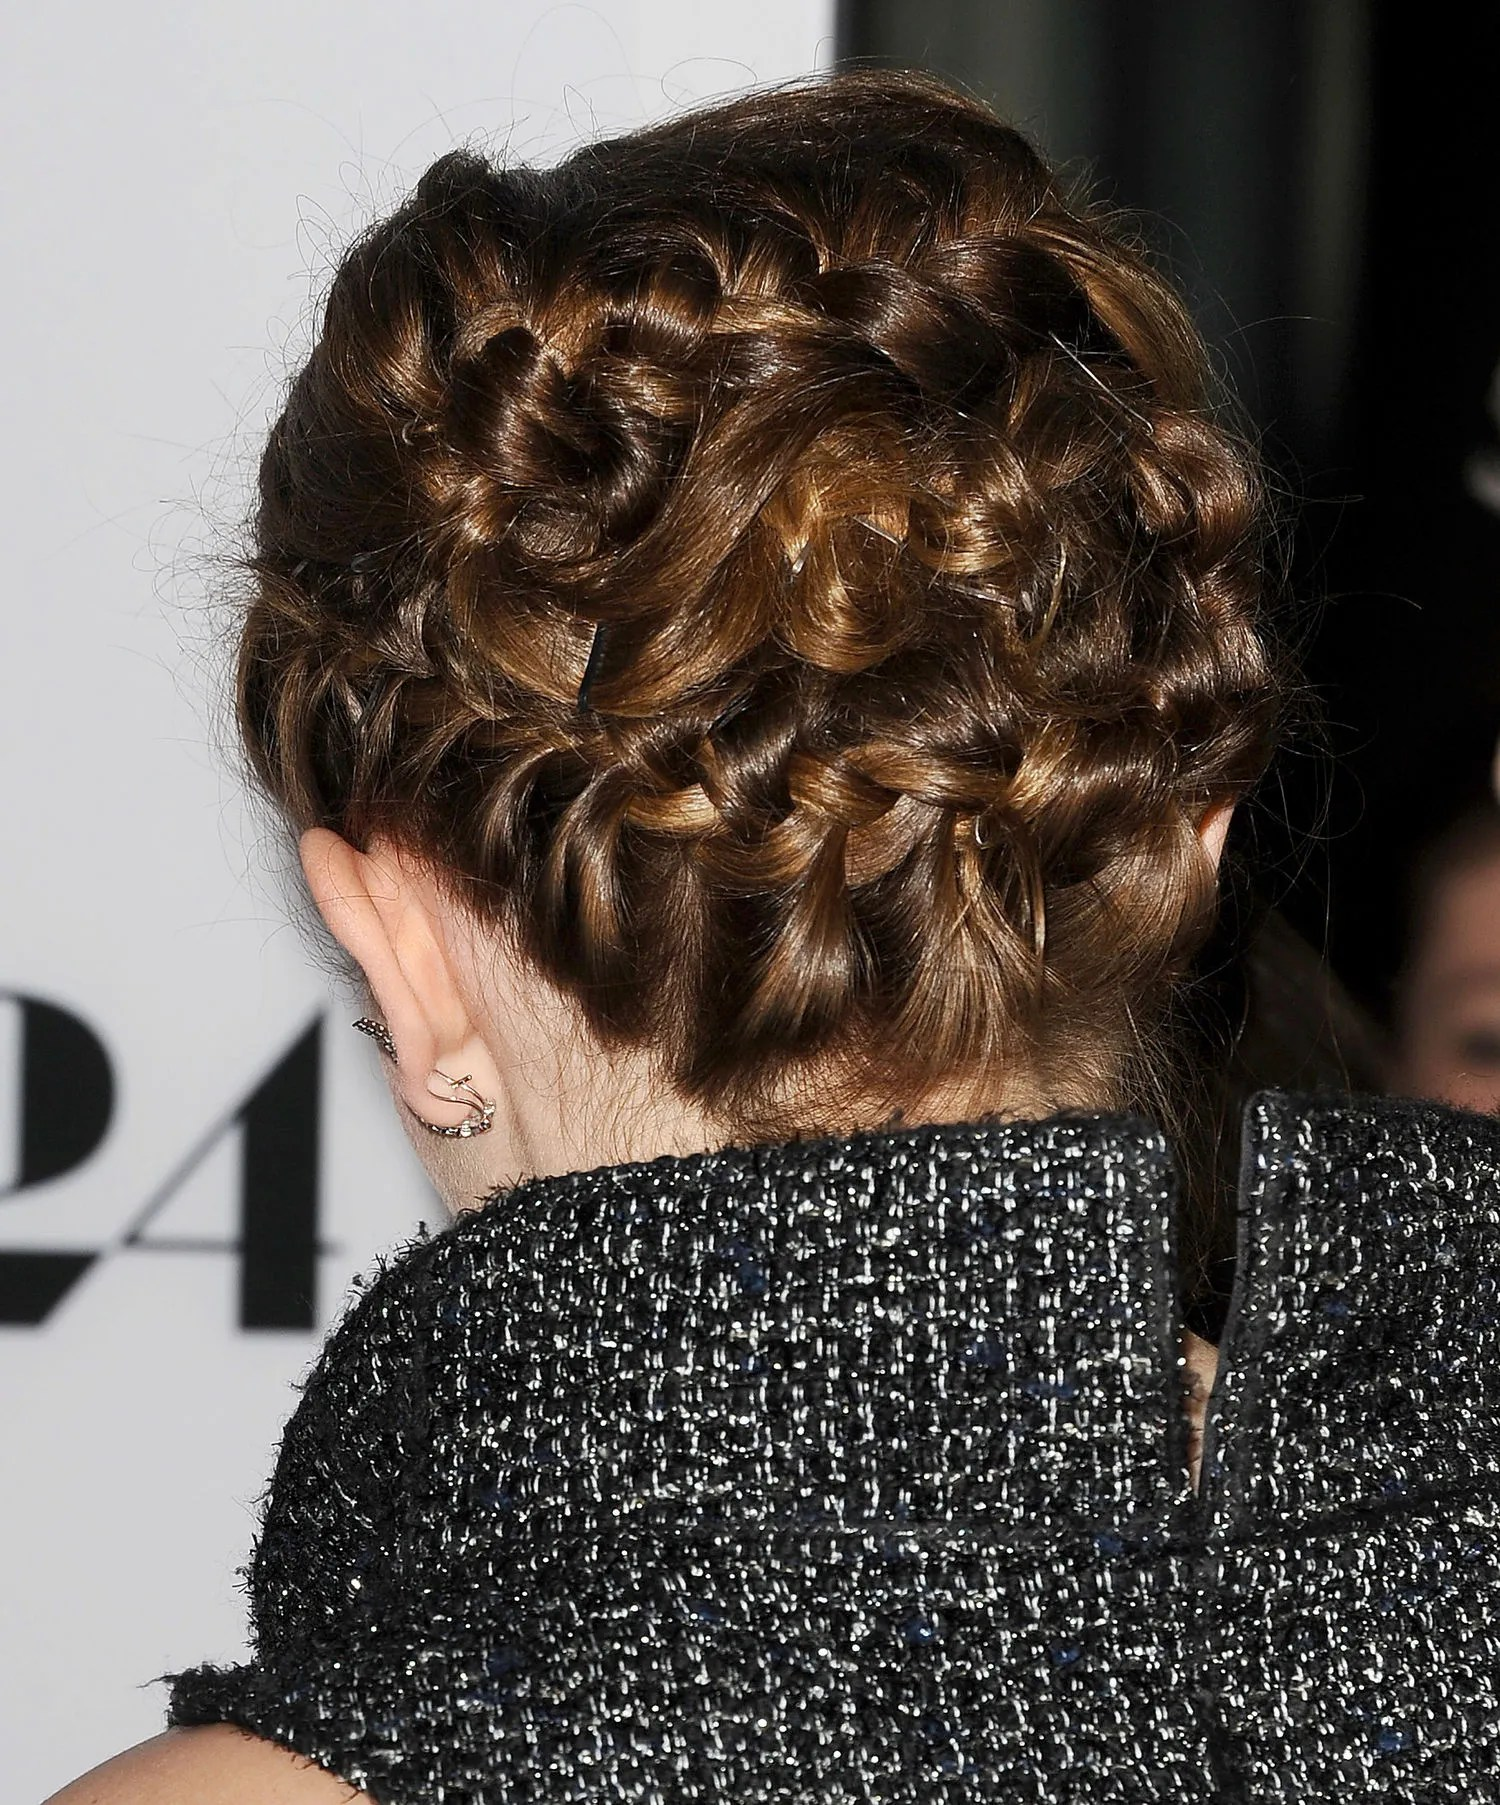 Emma Watson Wore A Braided Updo Last Night That Will Make